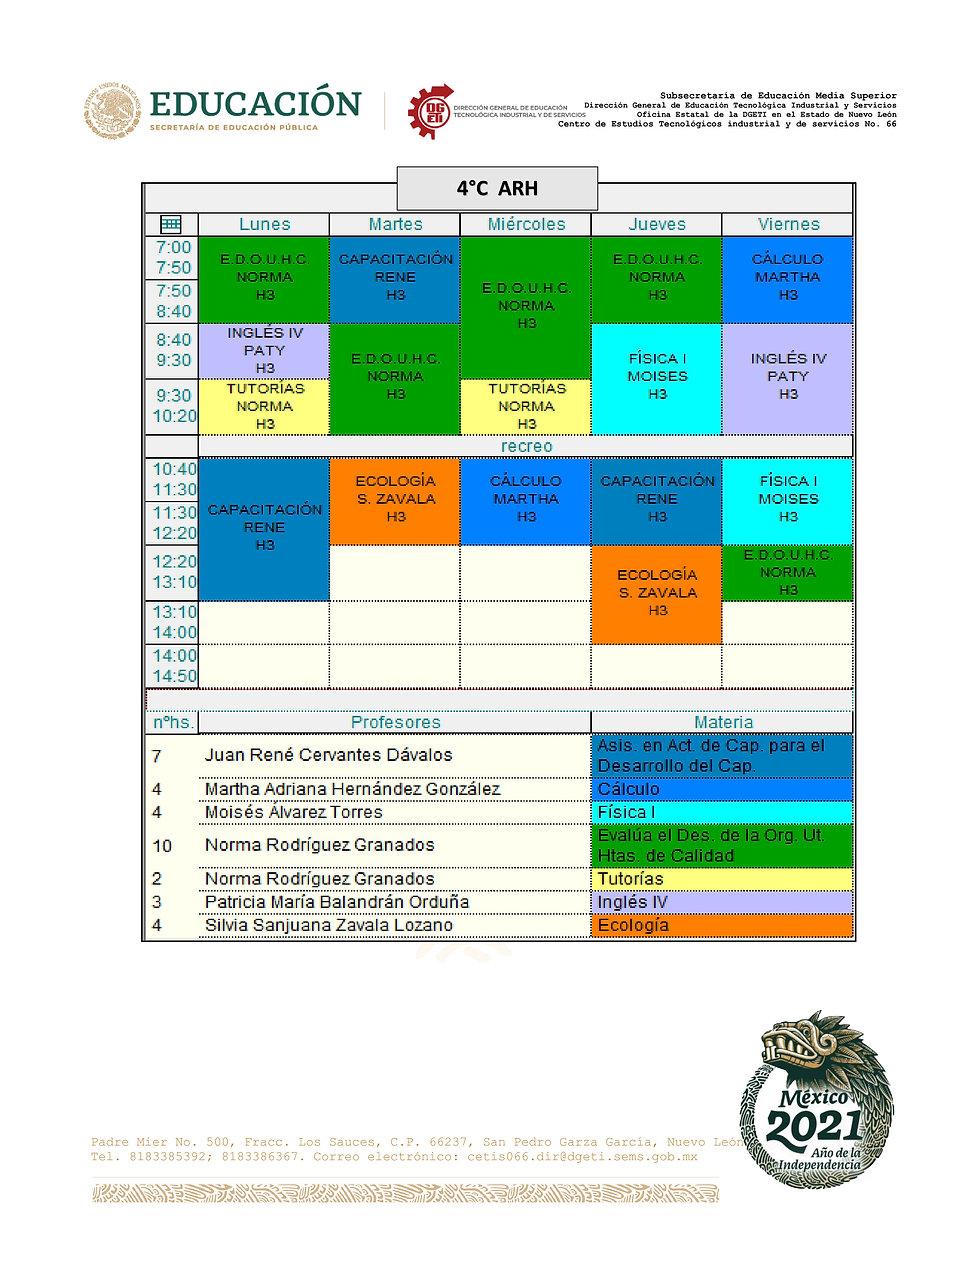 2-HORARIOS CUARTO SEMESTRE TM EFB-JUL202